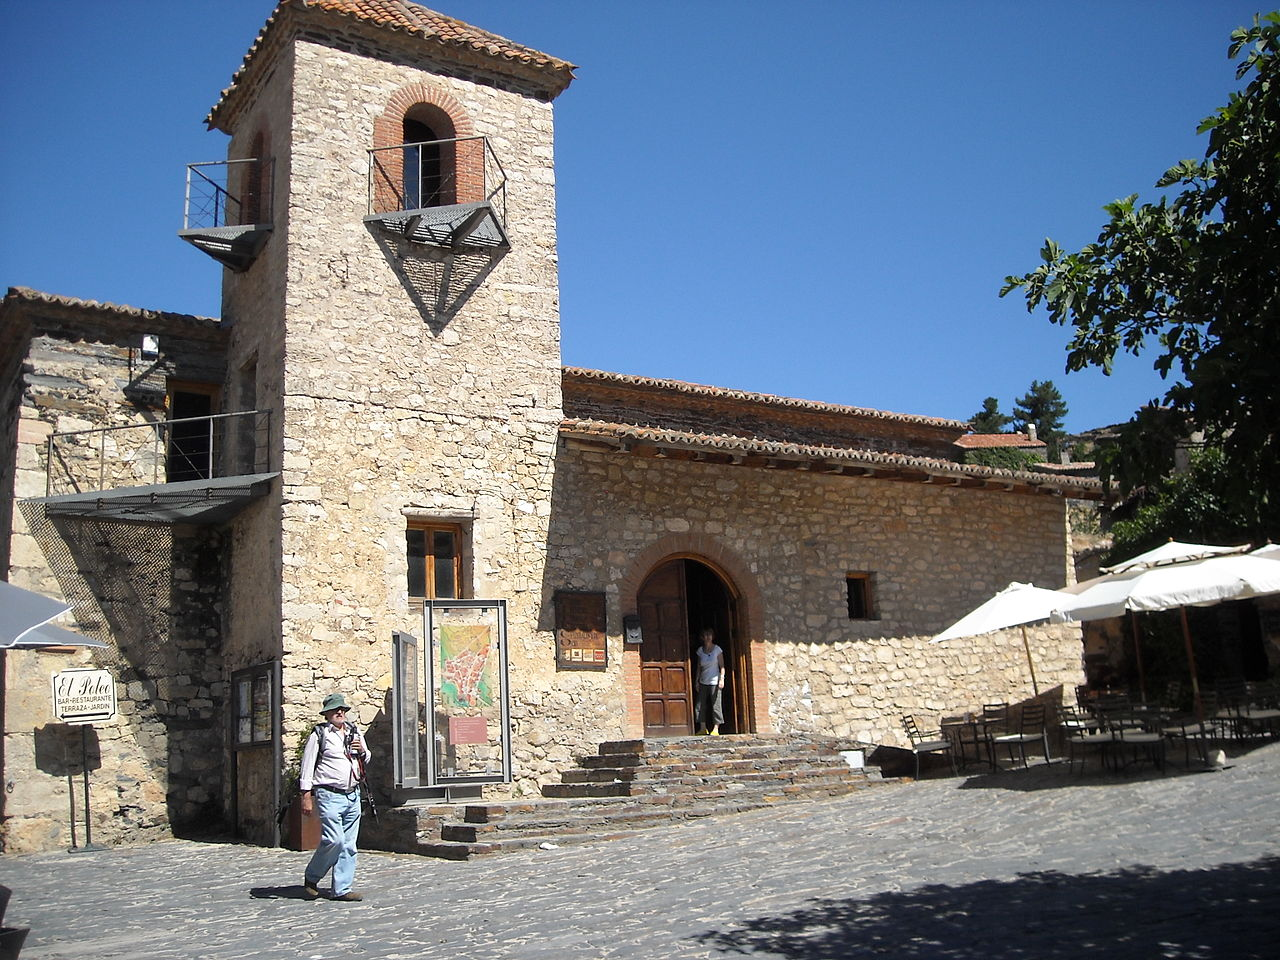 Vista de la iglesia de San José